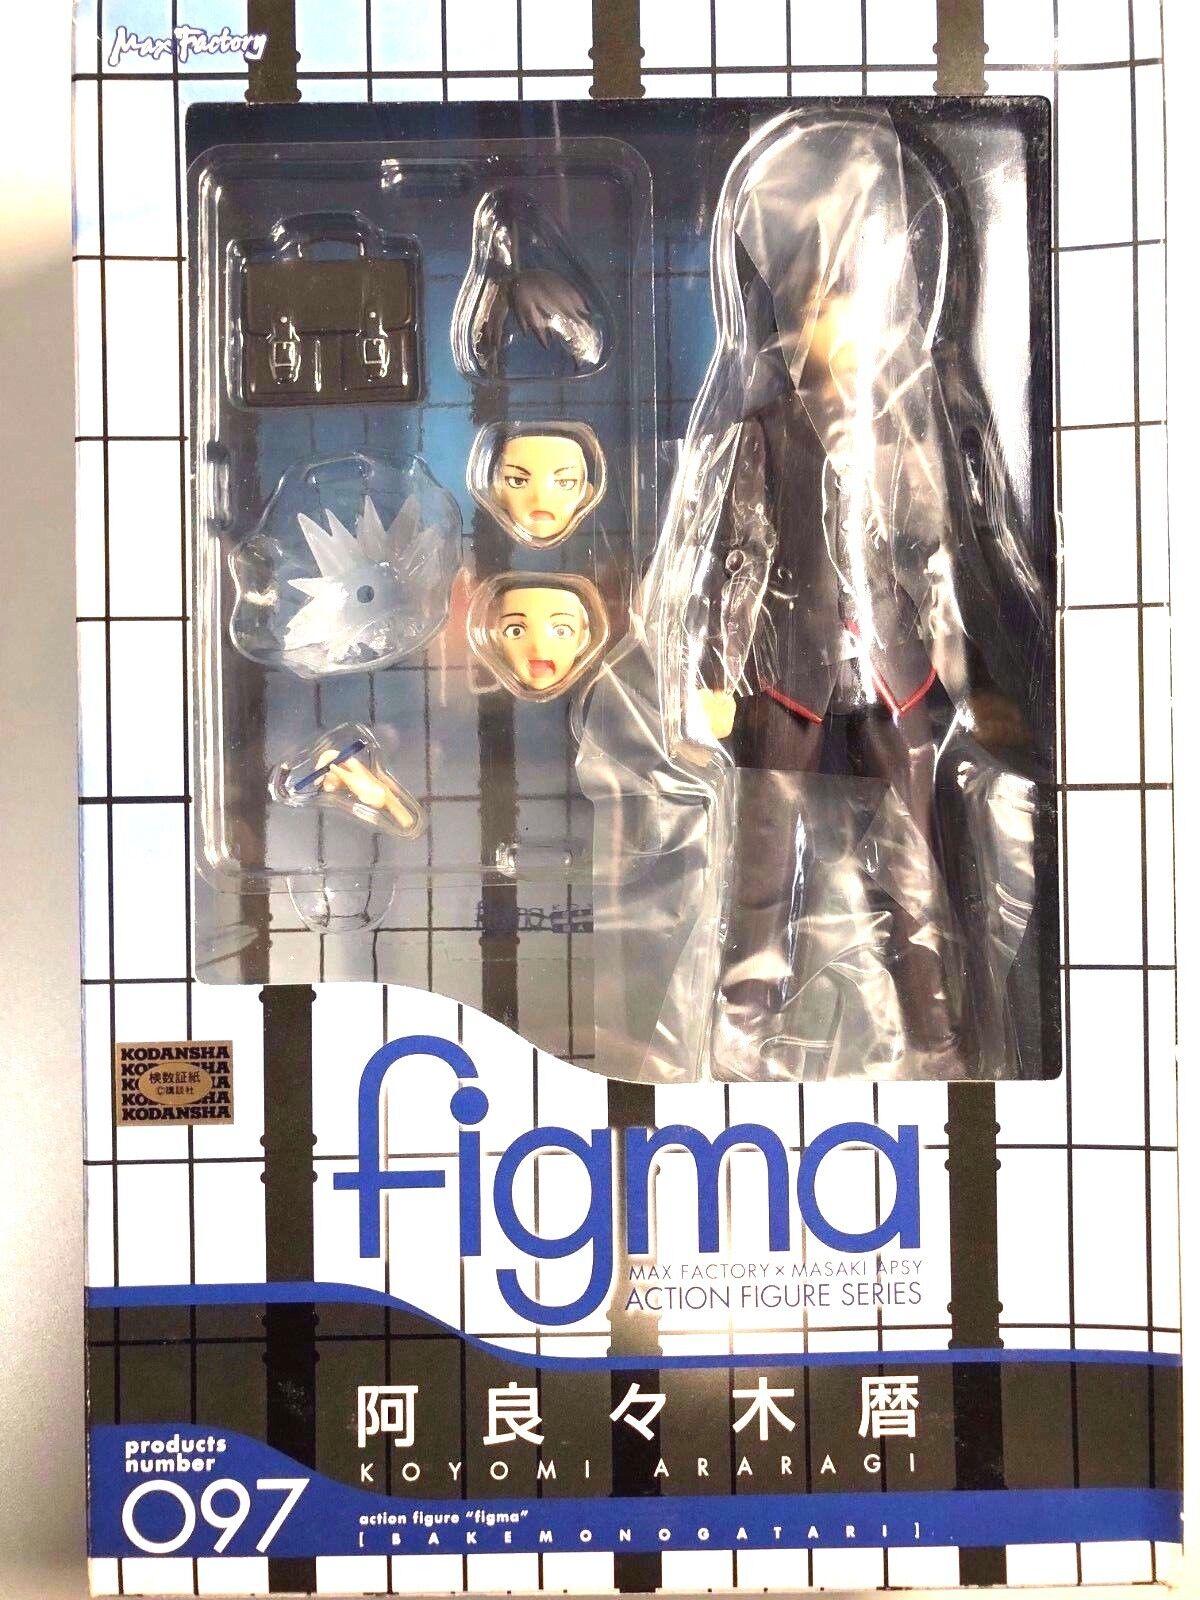 Free Shipping fromJapan Authentic Figma Koyomi Araragi Bakemonogatari MaxFactory